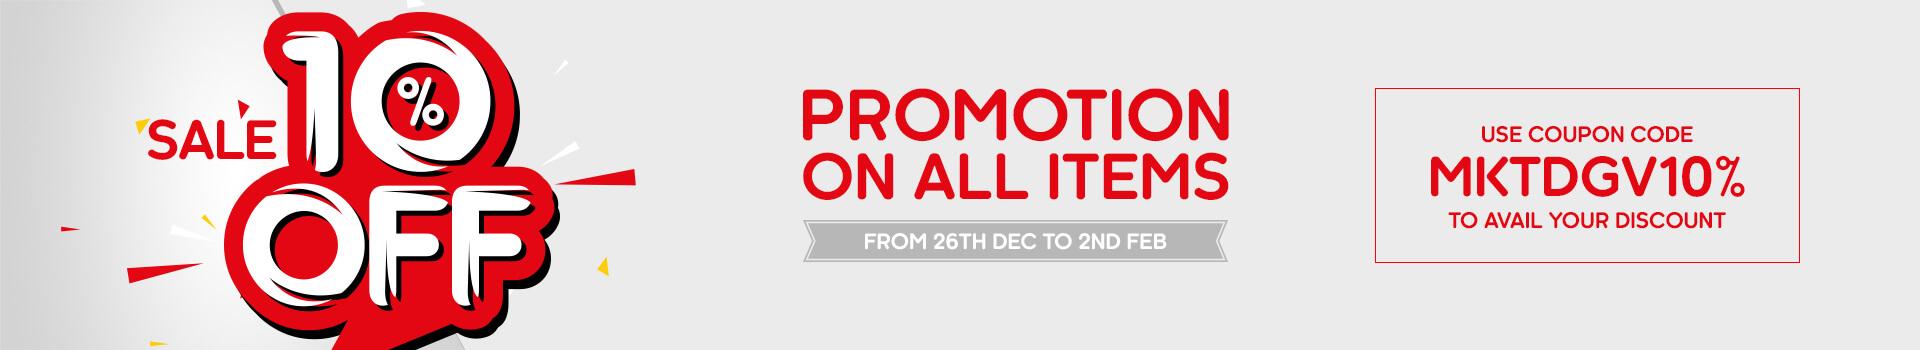 brands-offer-banner